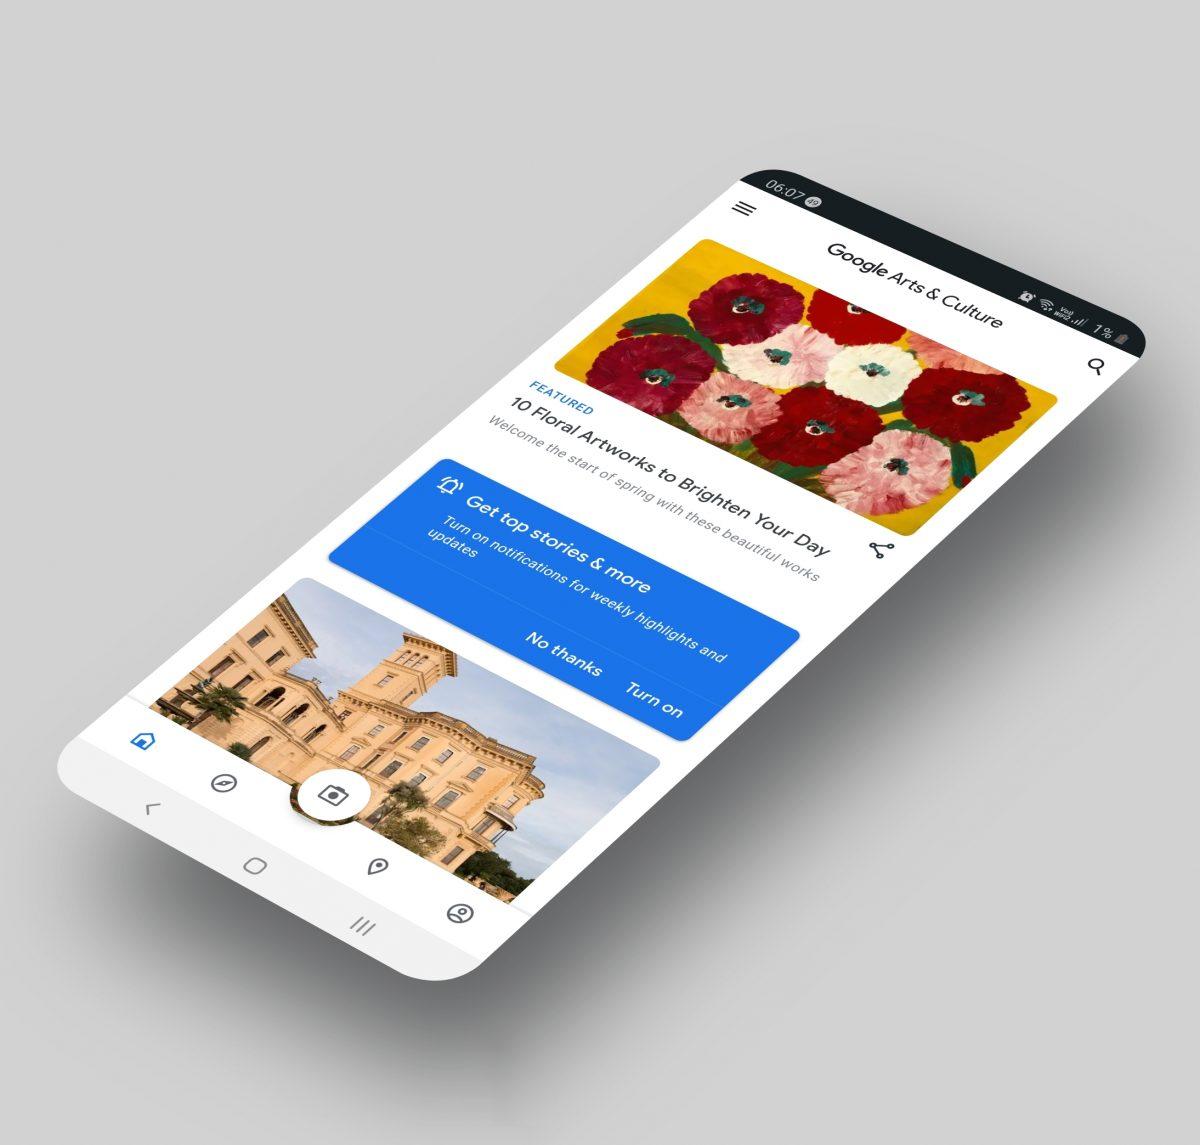 Remember Prisma? Google Arts & Culture app offers a similar feature